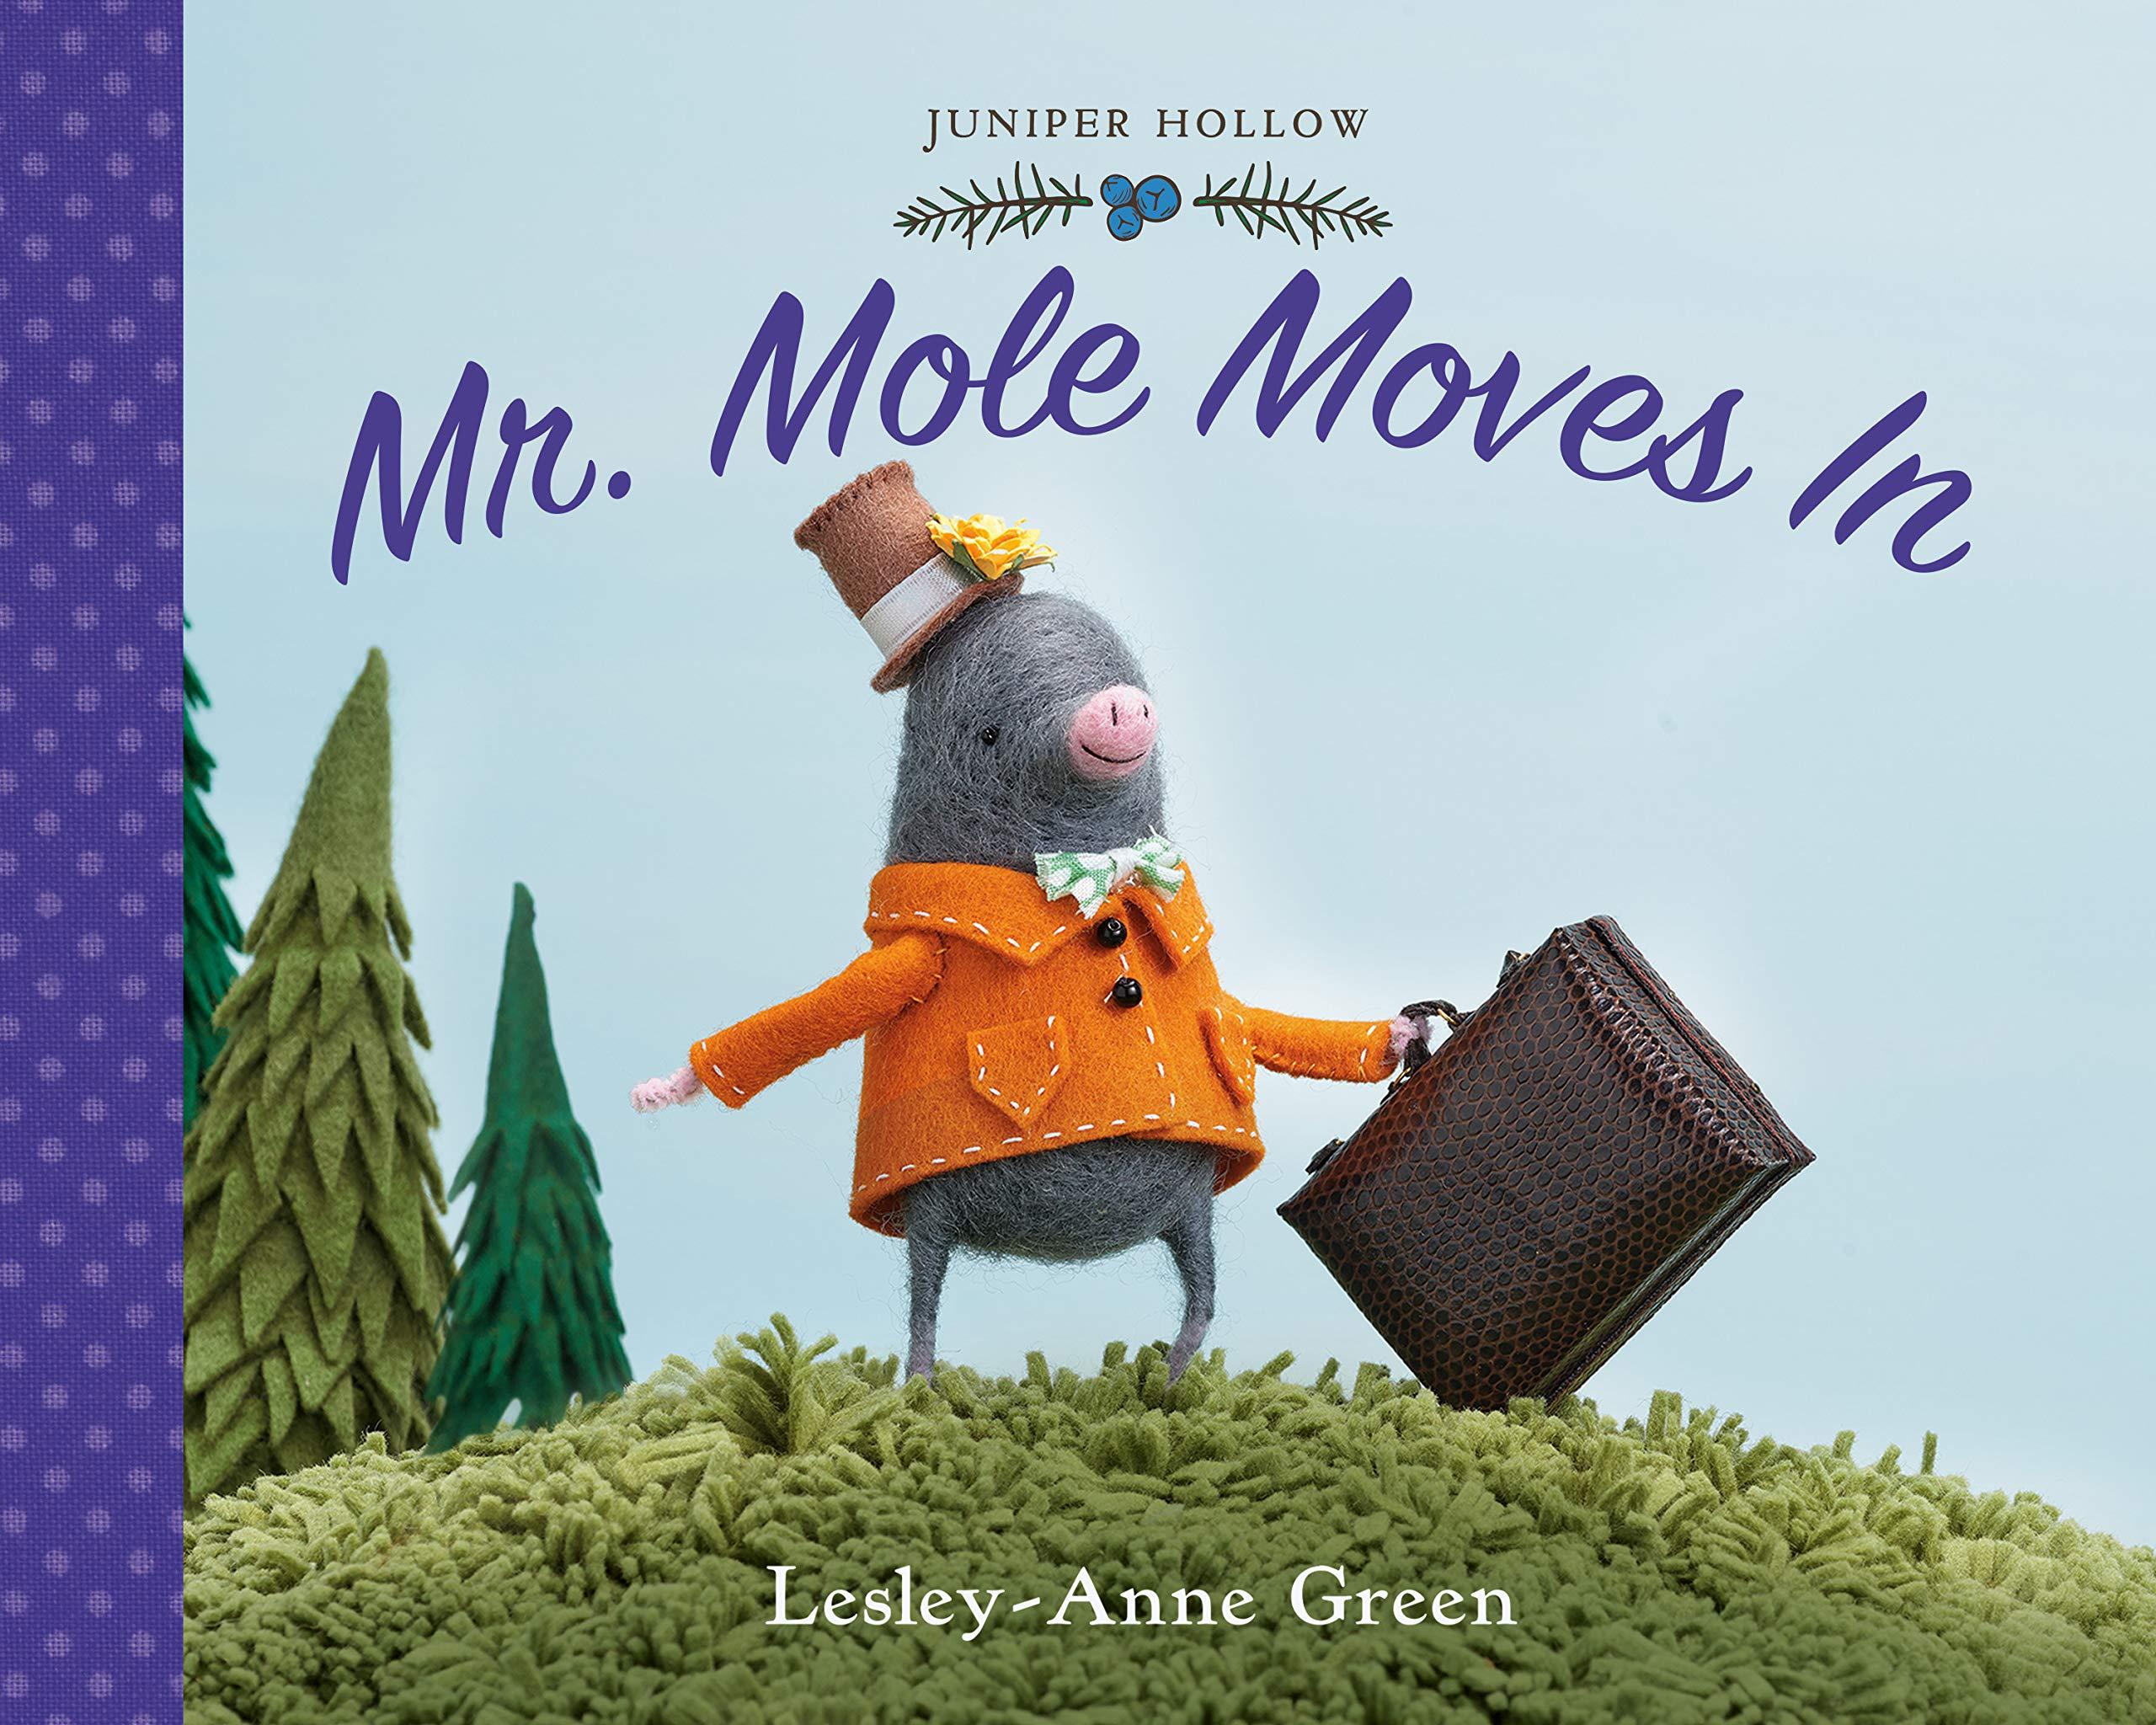 celebrate-picture-books-picture-book-review-mr-mole-moves-in-cover